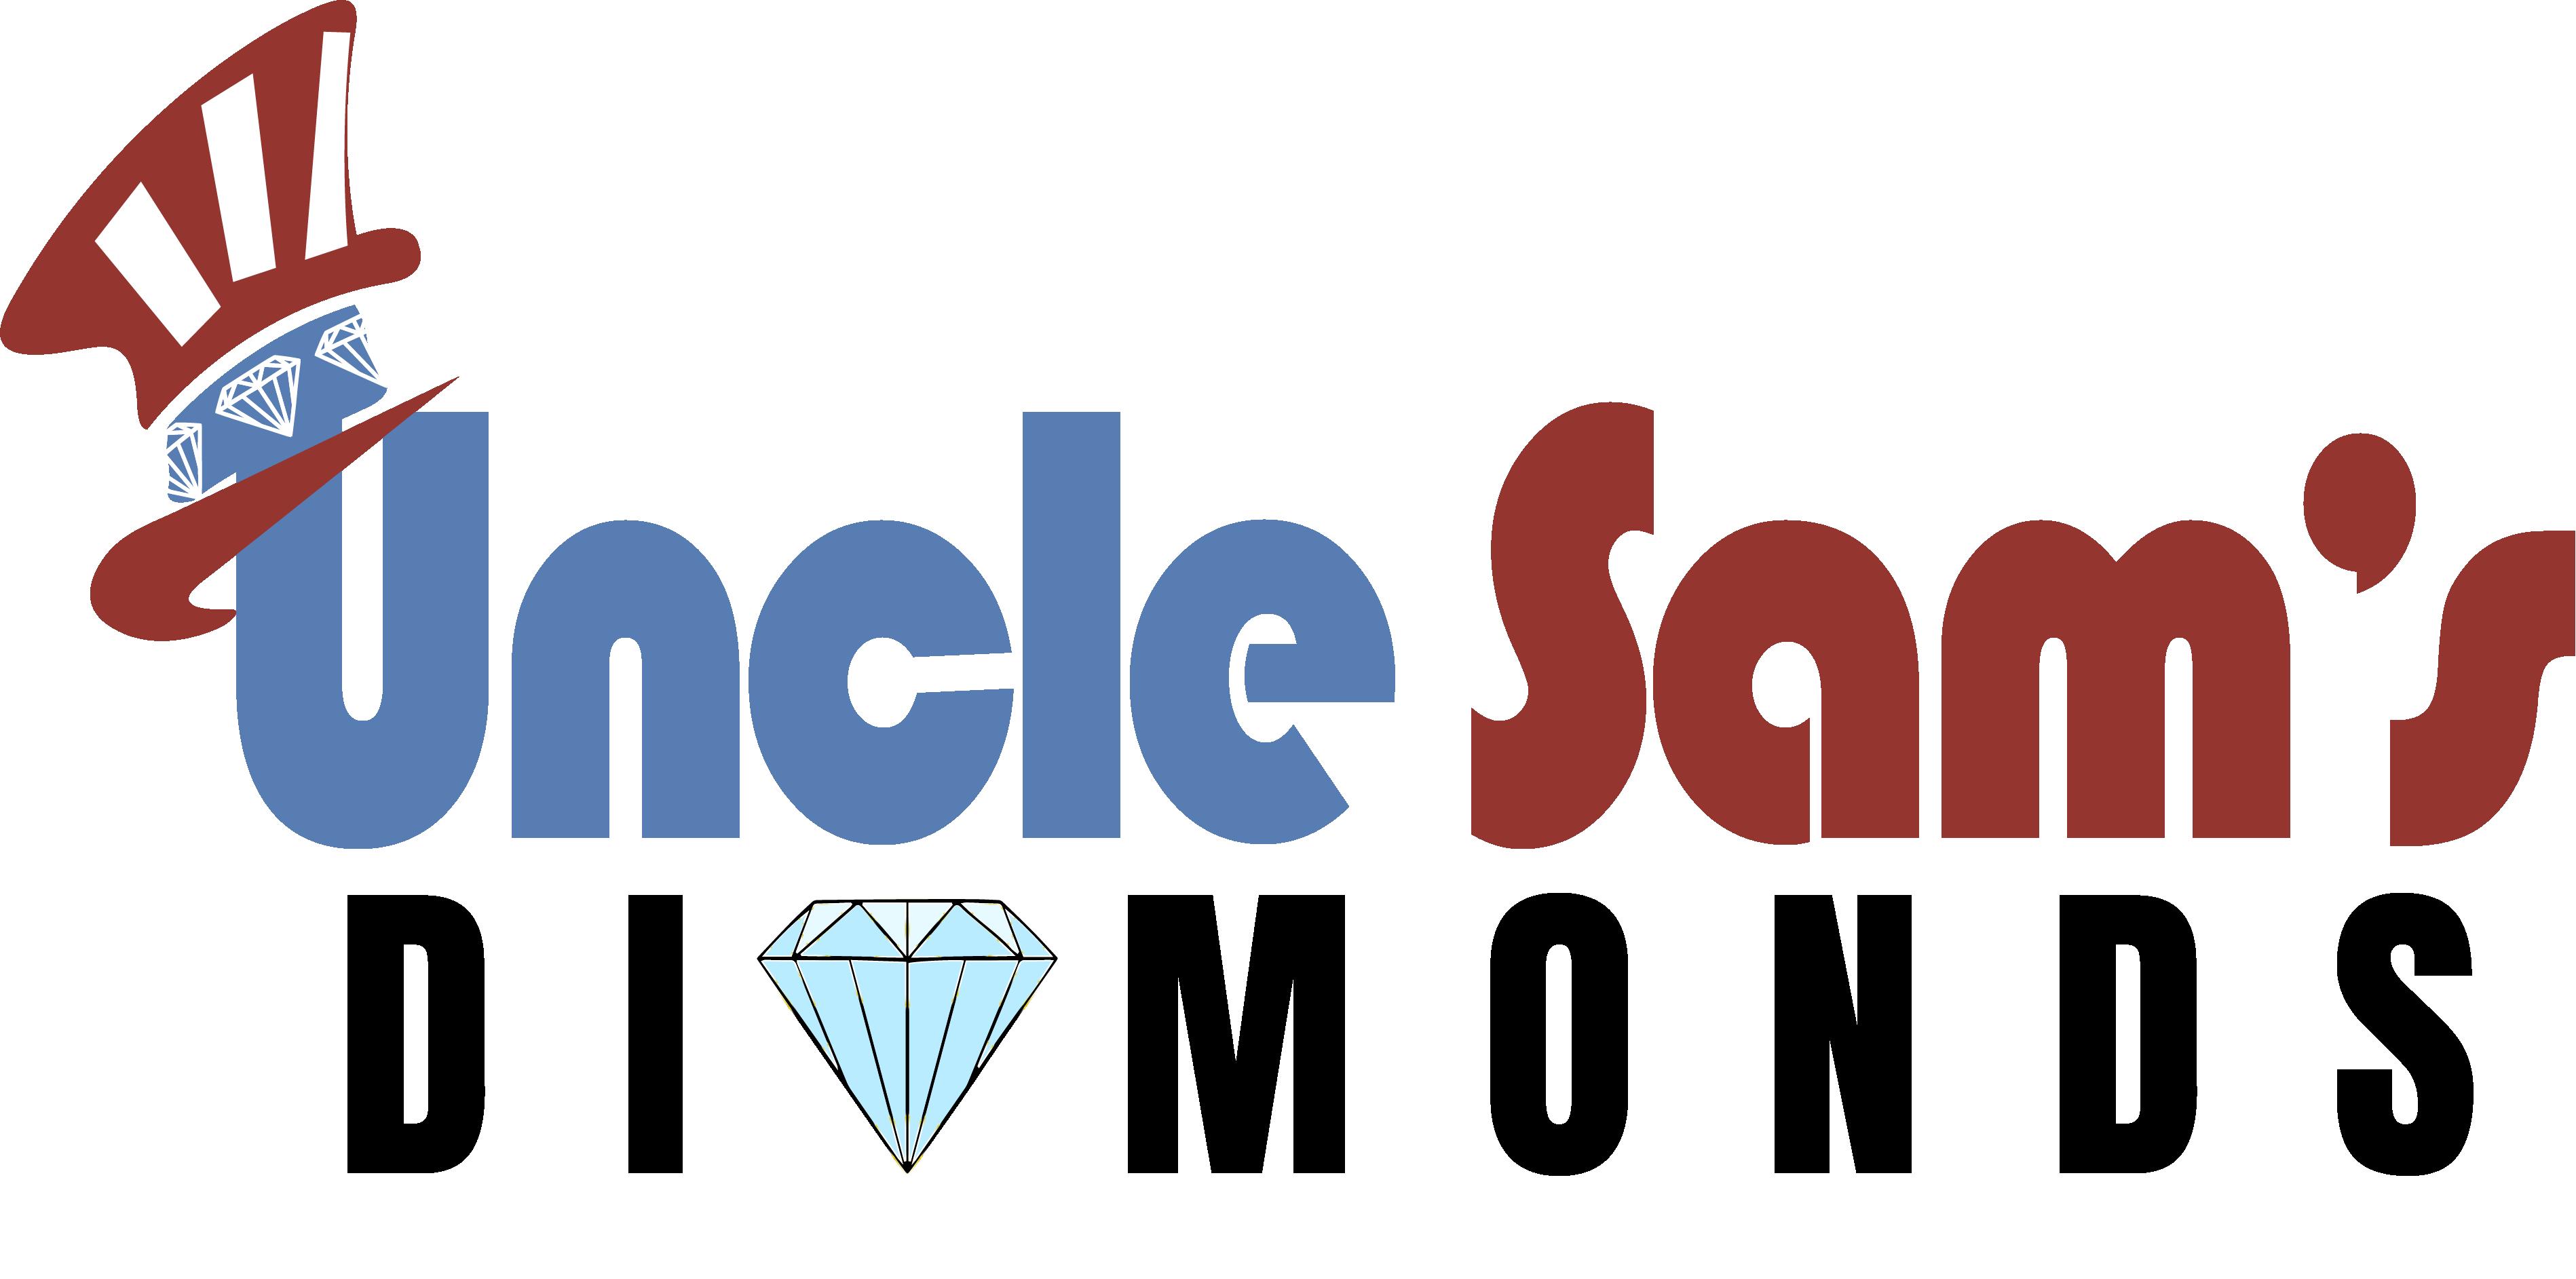 UNCLE SAM'S DIAMONDS